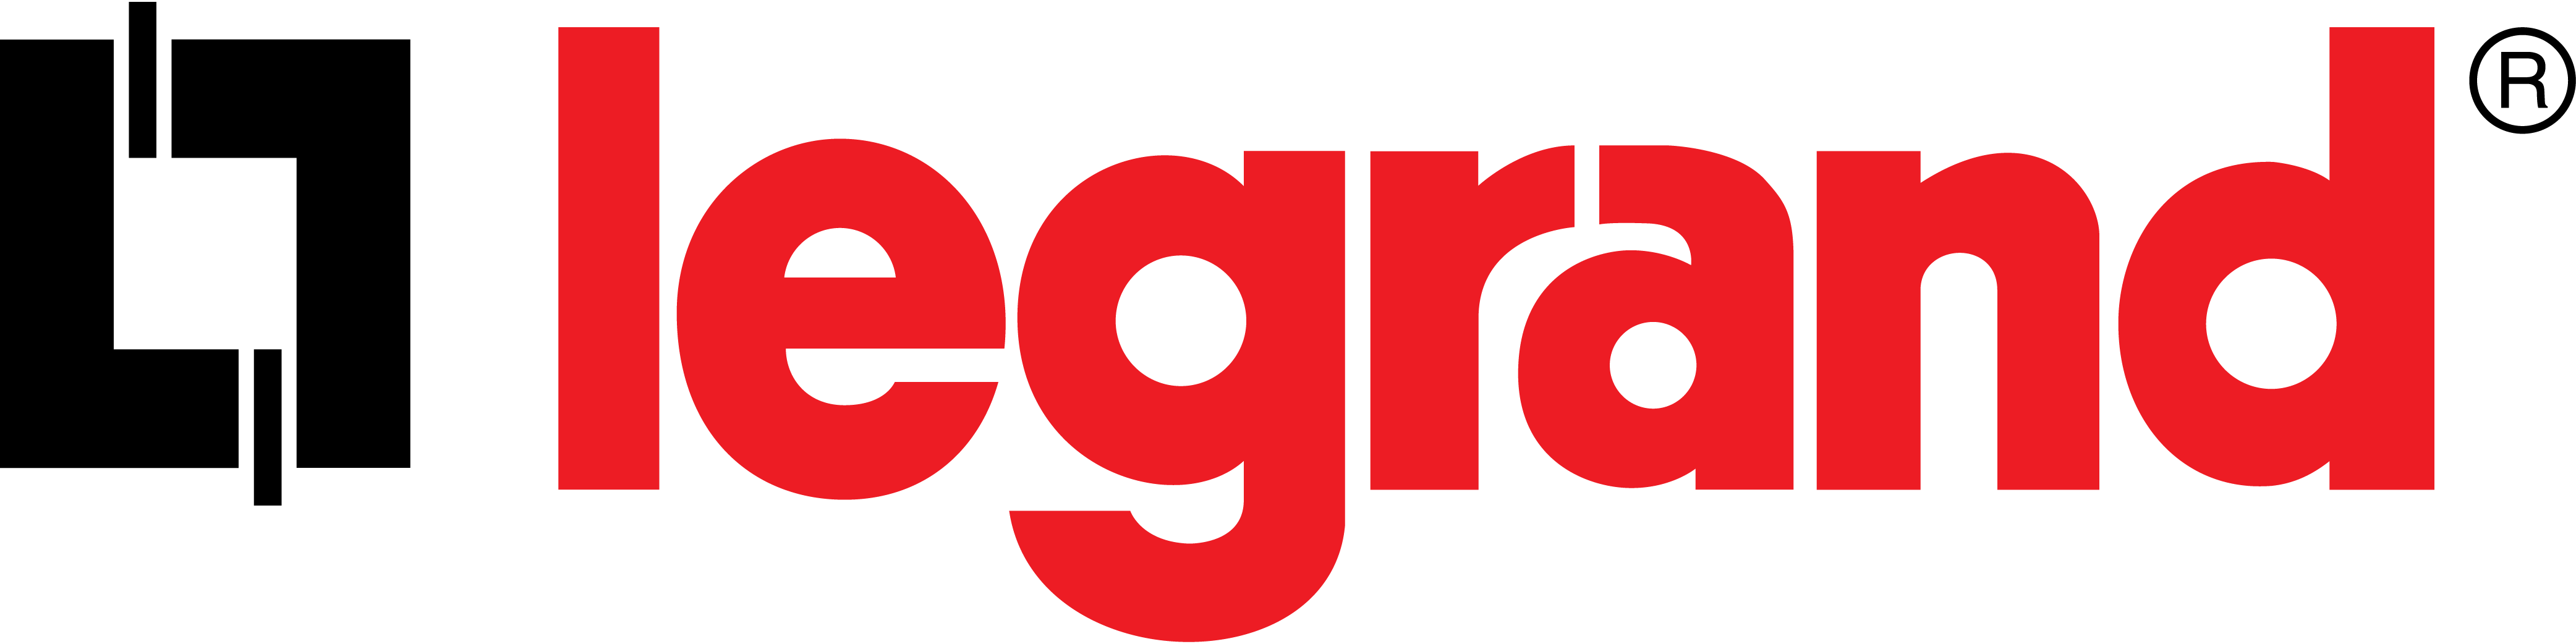 Legrand (Prancūzija)